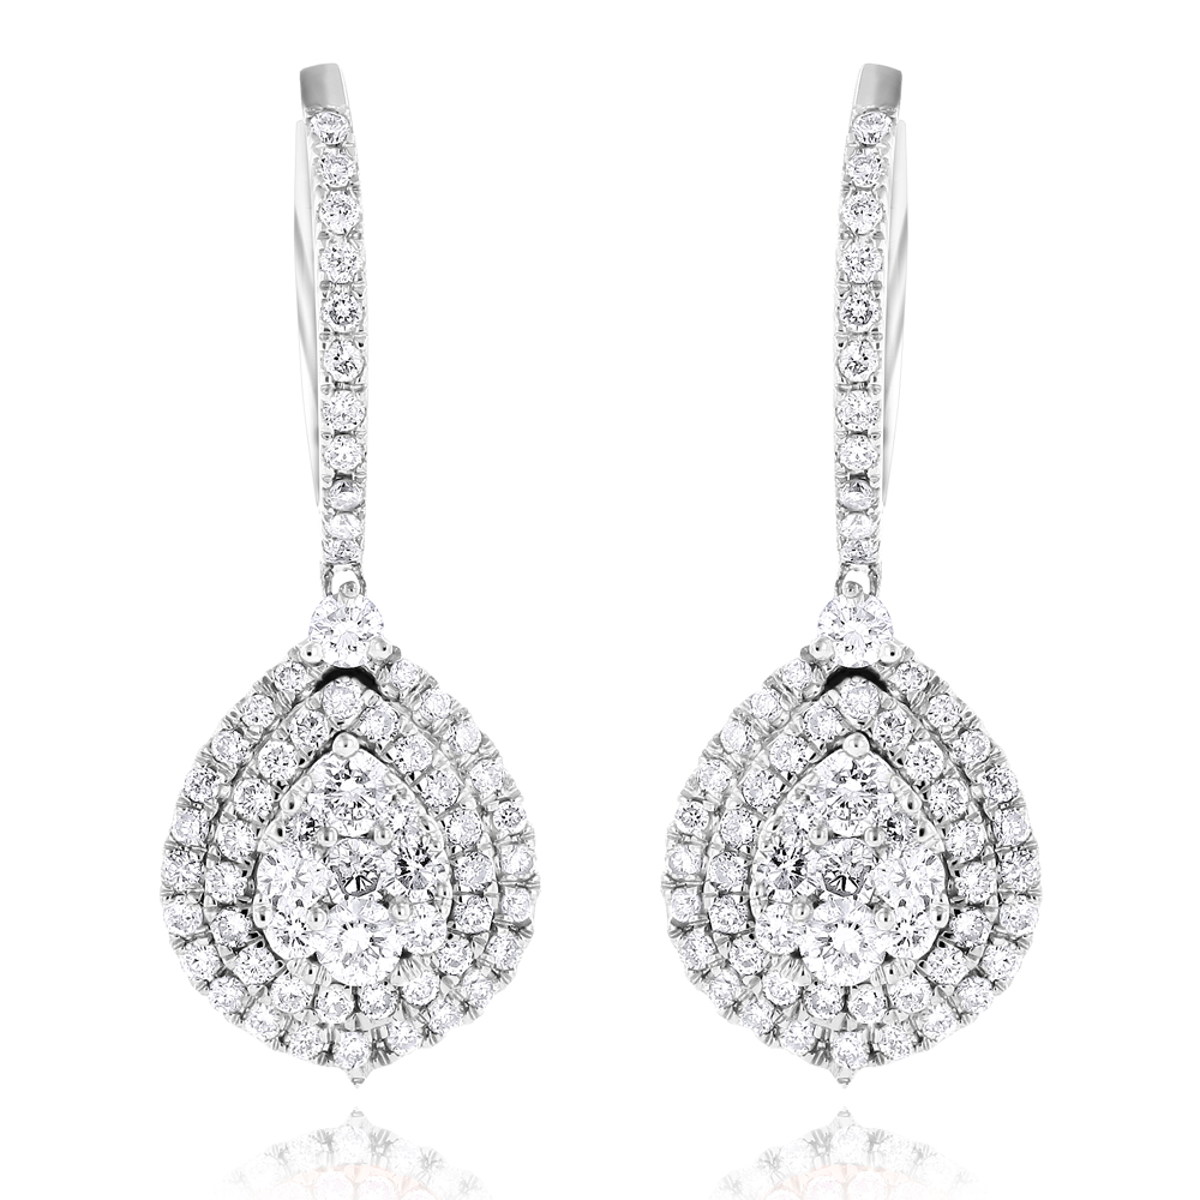 Diamond Pear-Shaped Drop Earrings in 14K Yellow Rose White Gold 1.5ct